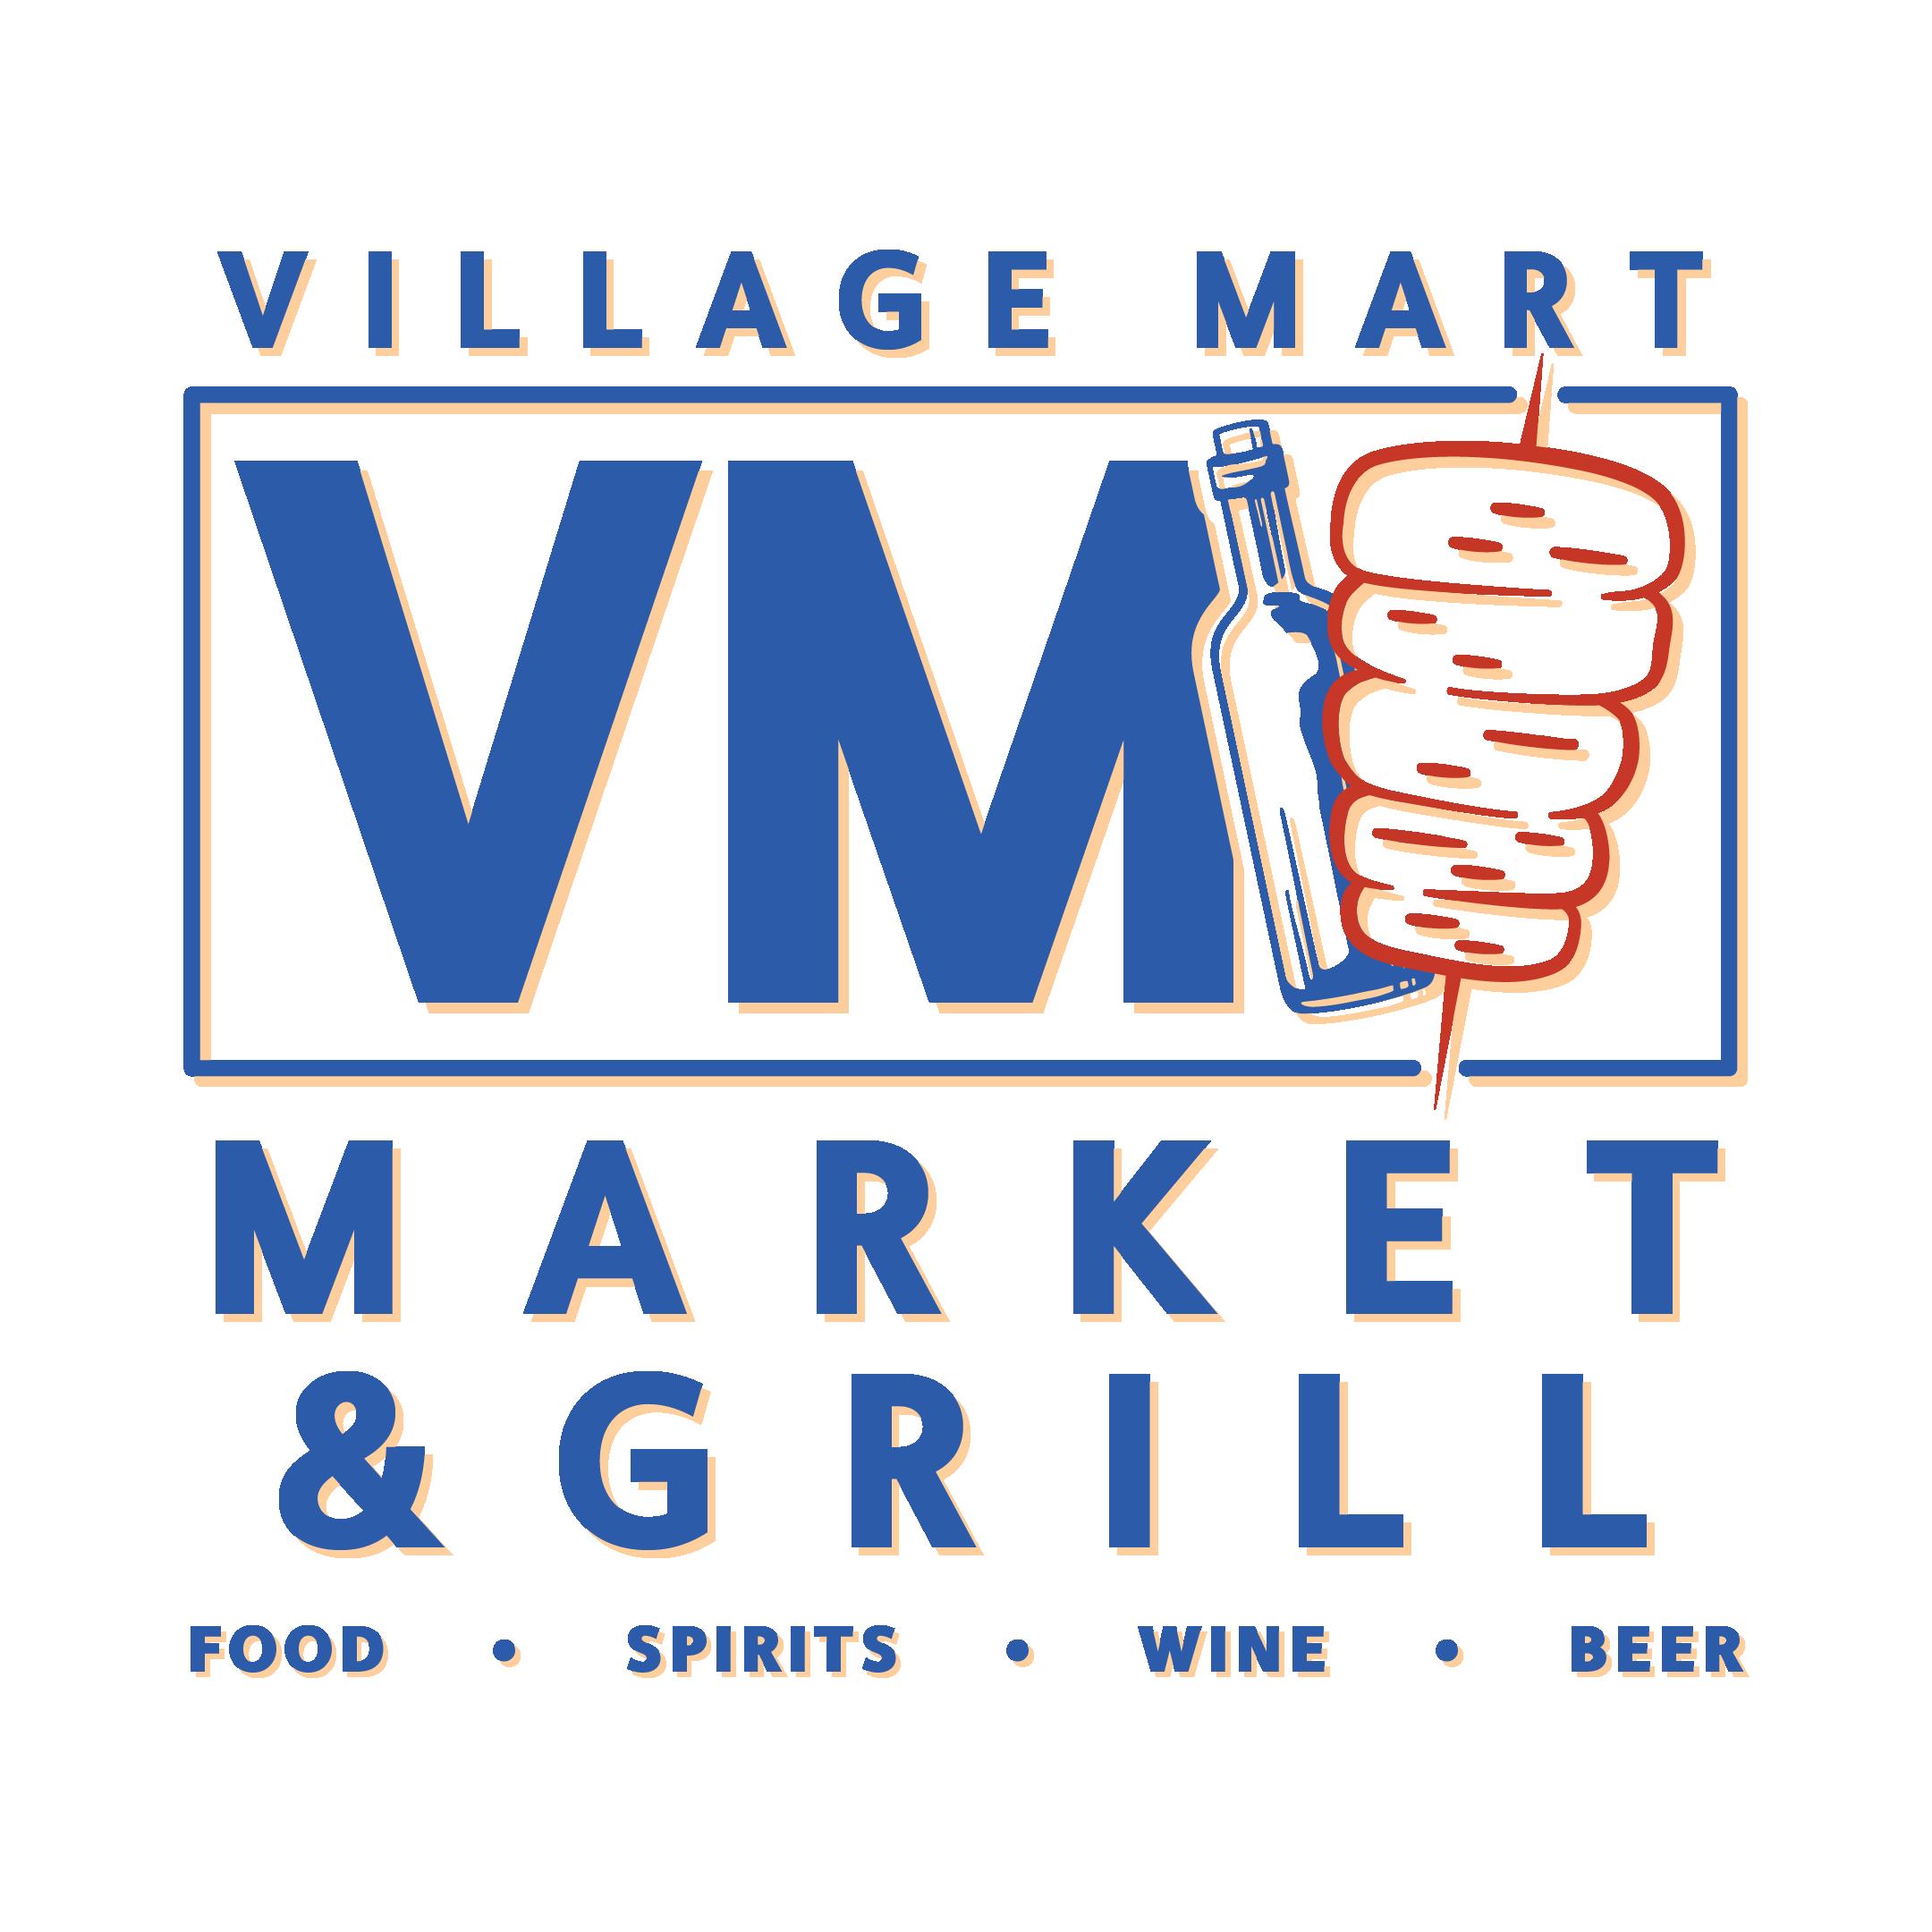 Village Mart logo